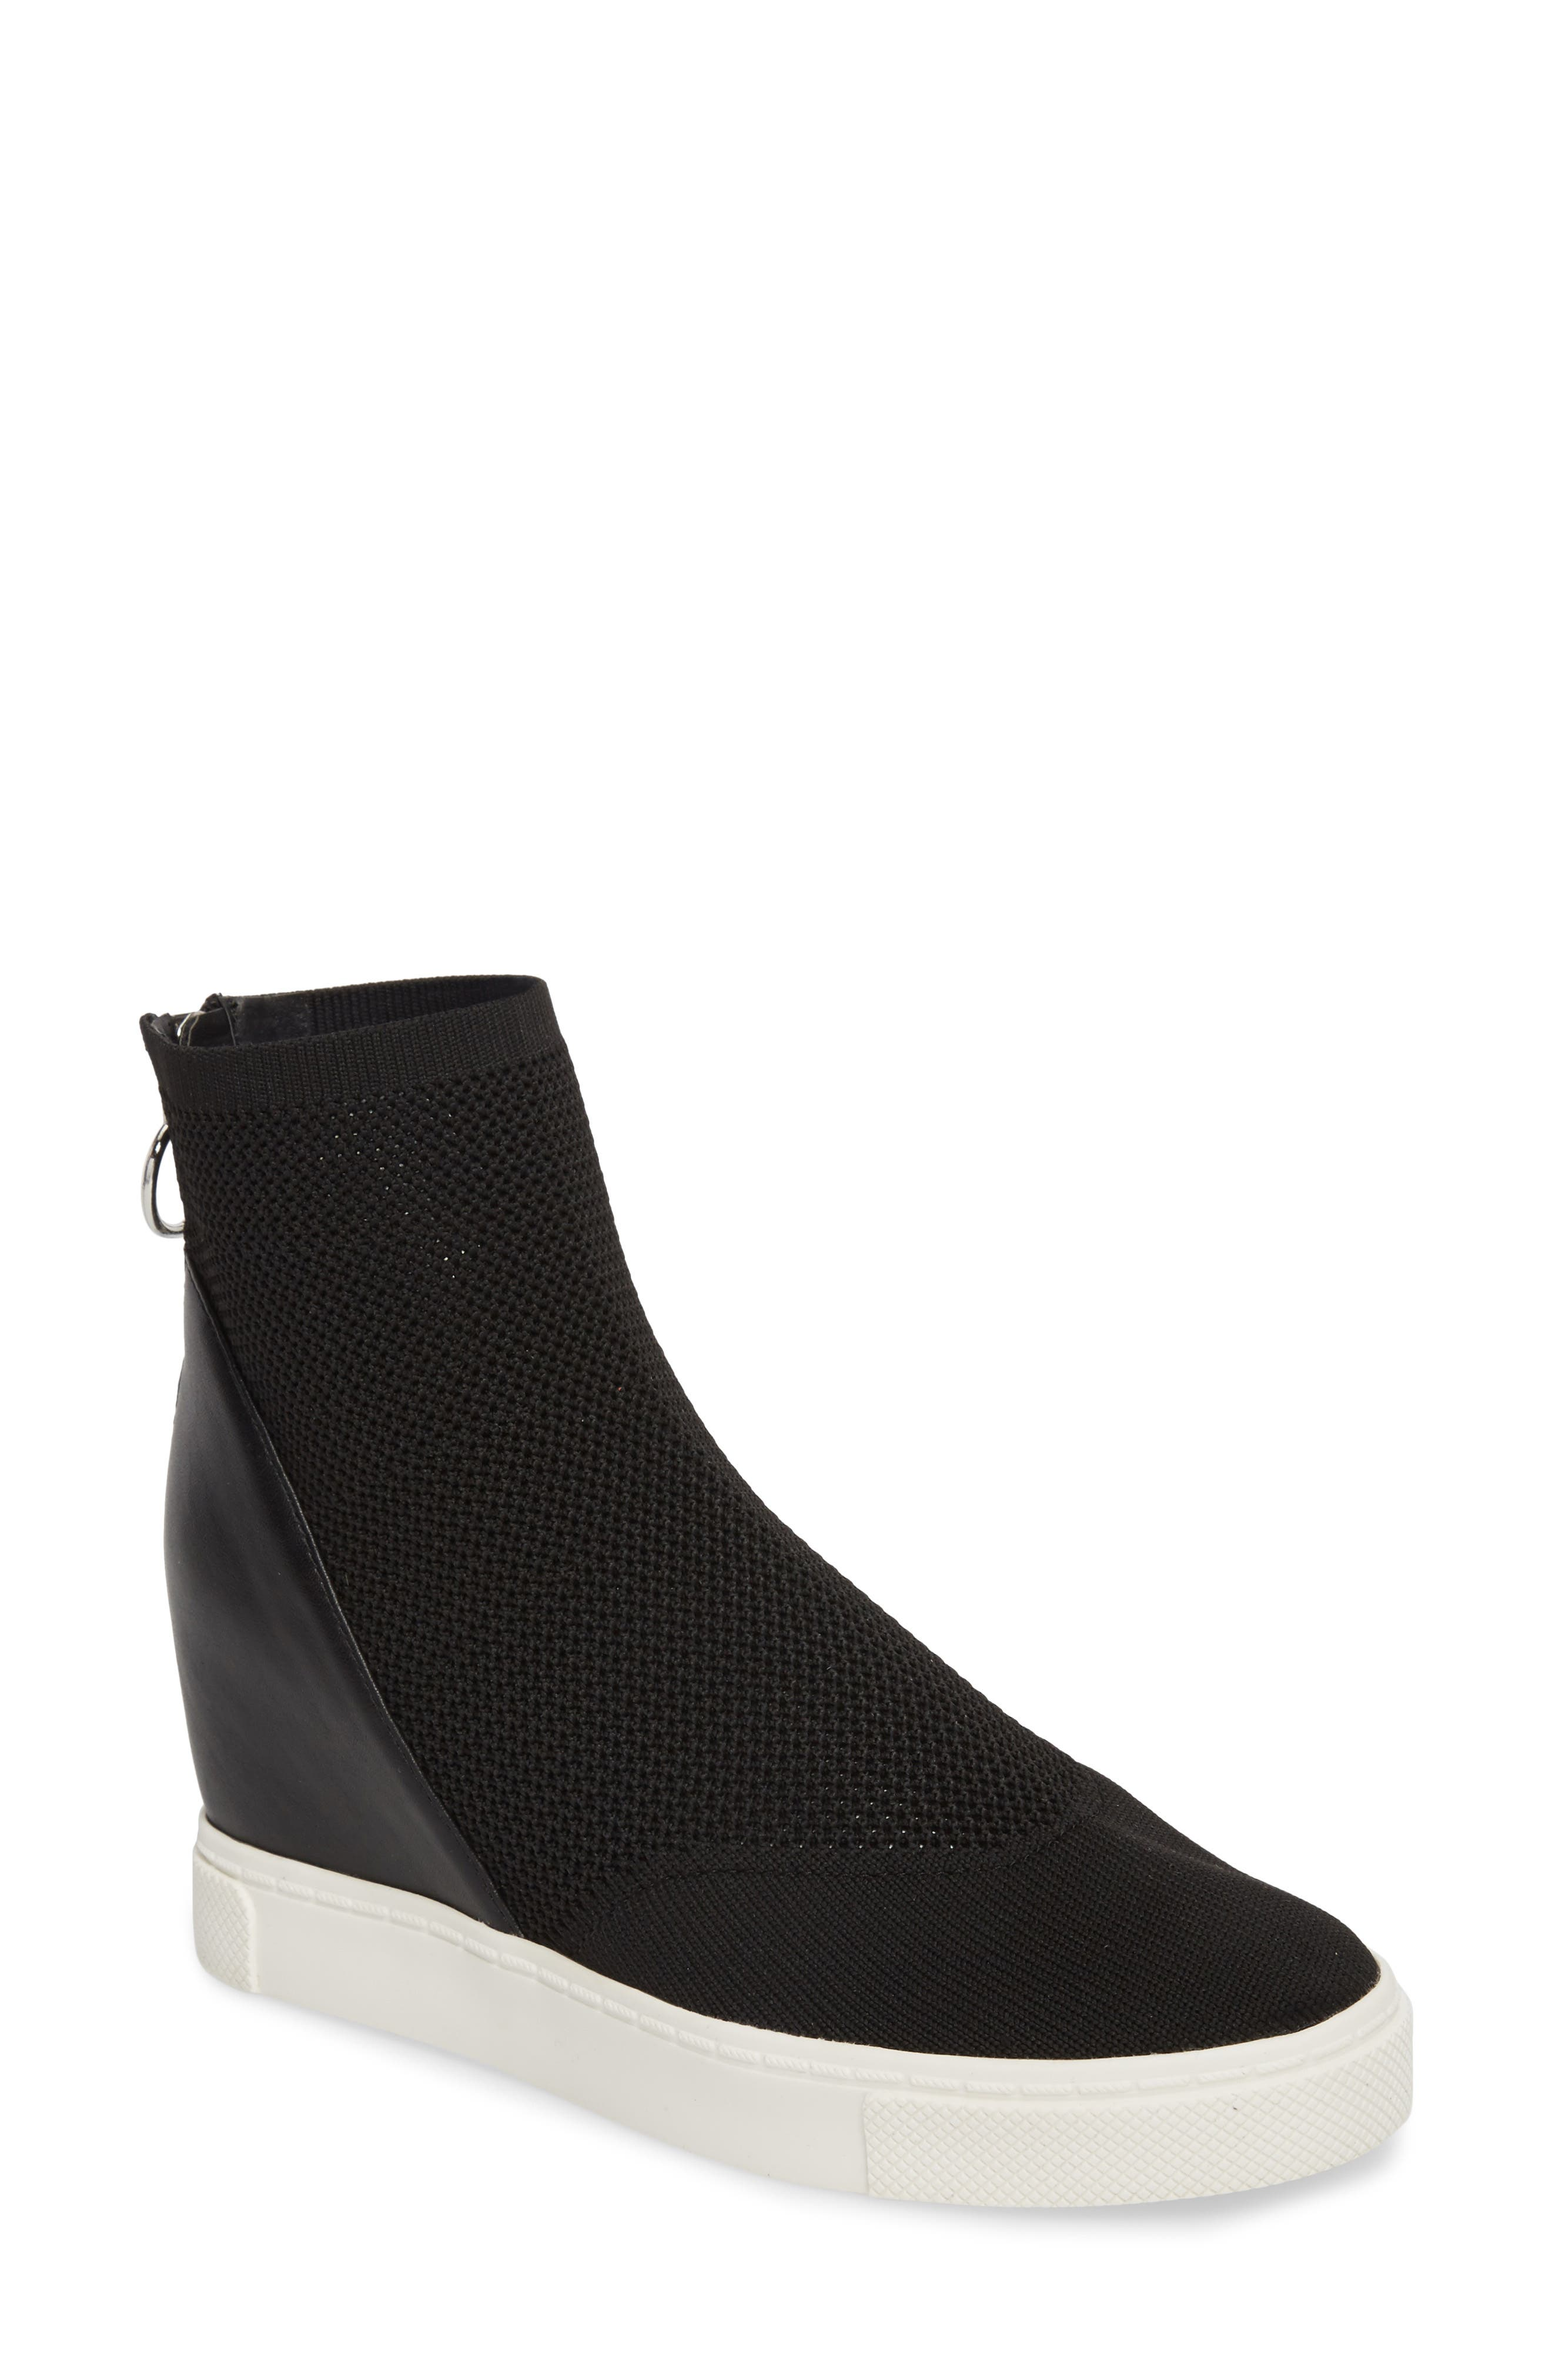 Lizzy Sneaker Bootie,                             Main thumbnail 1, color,                             Black